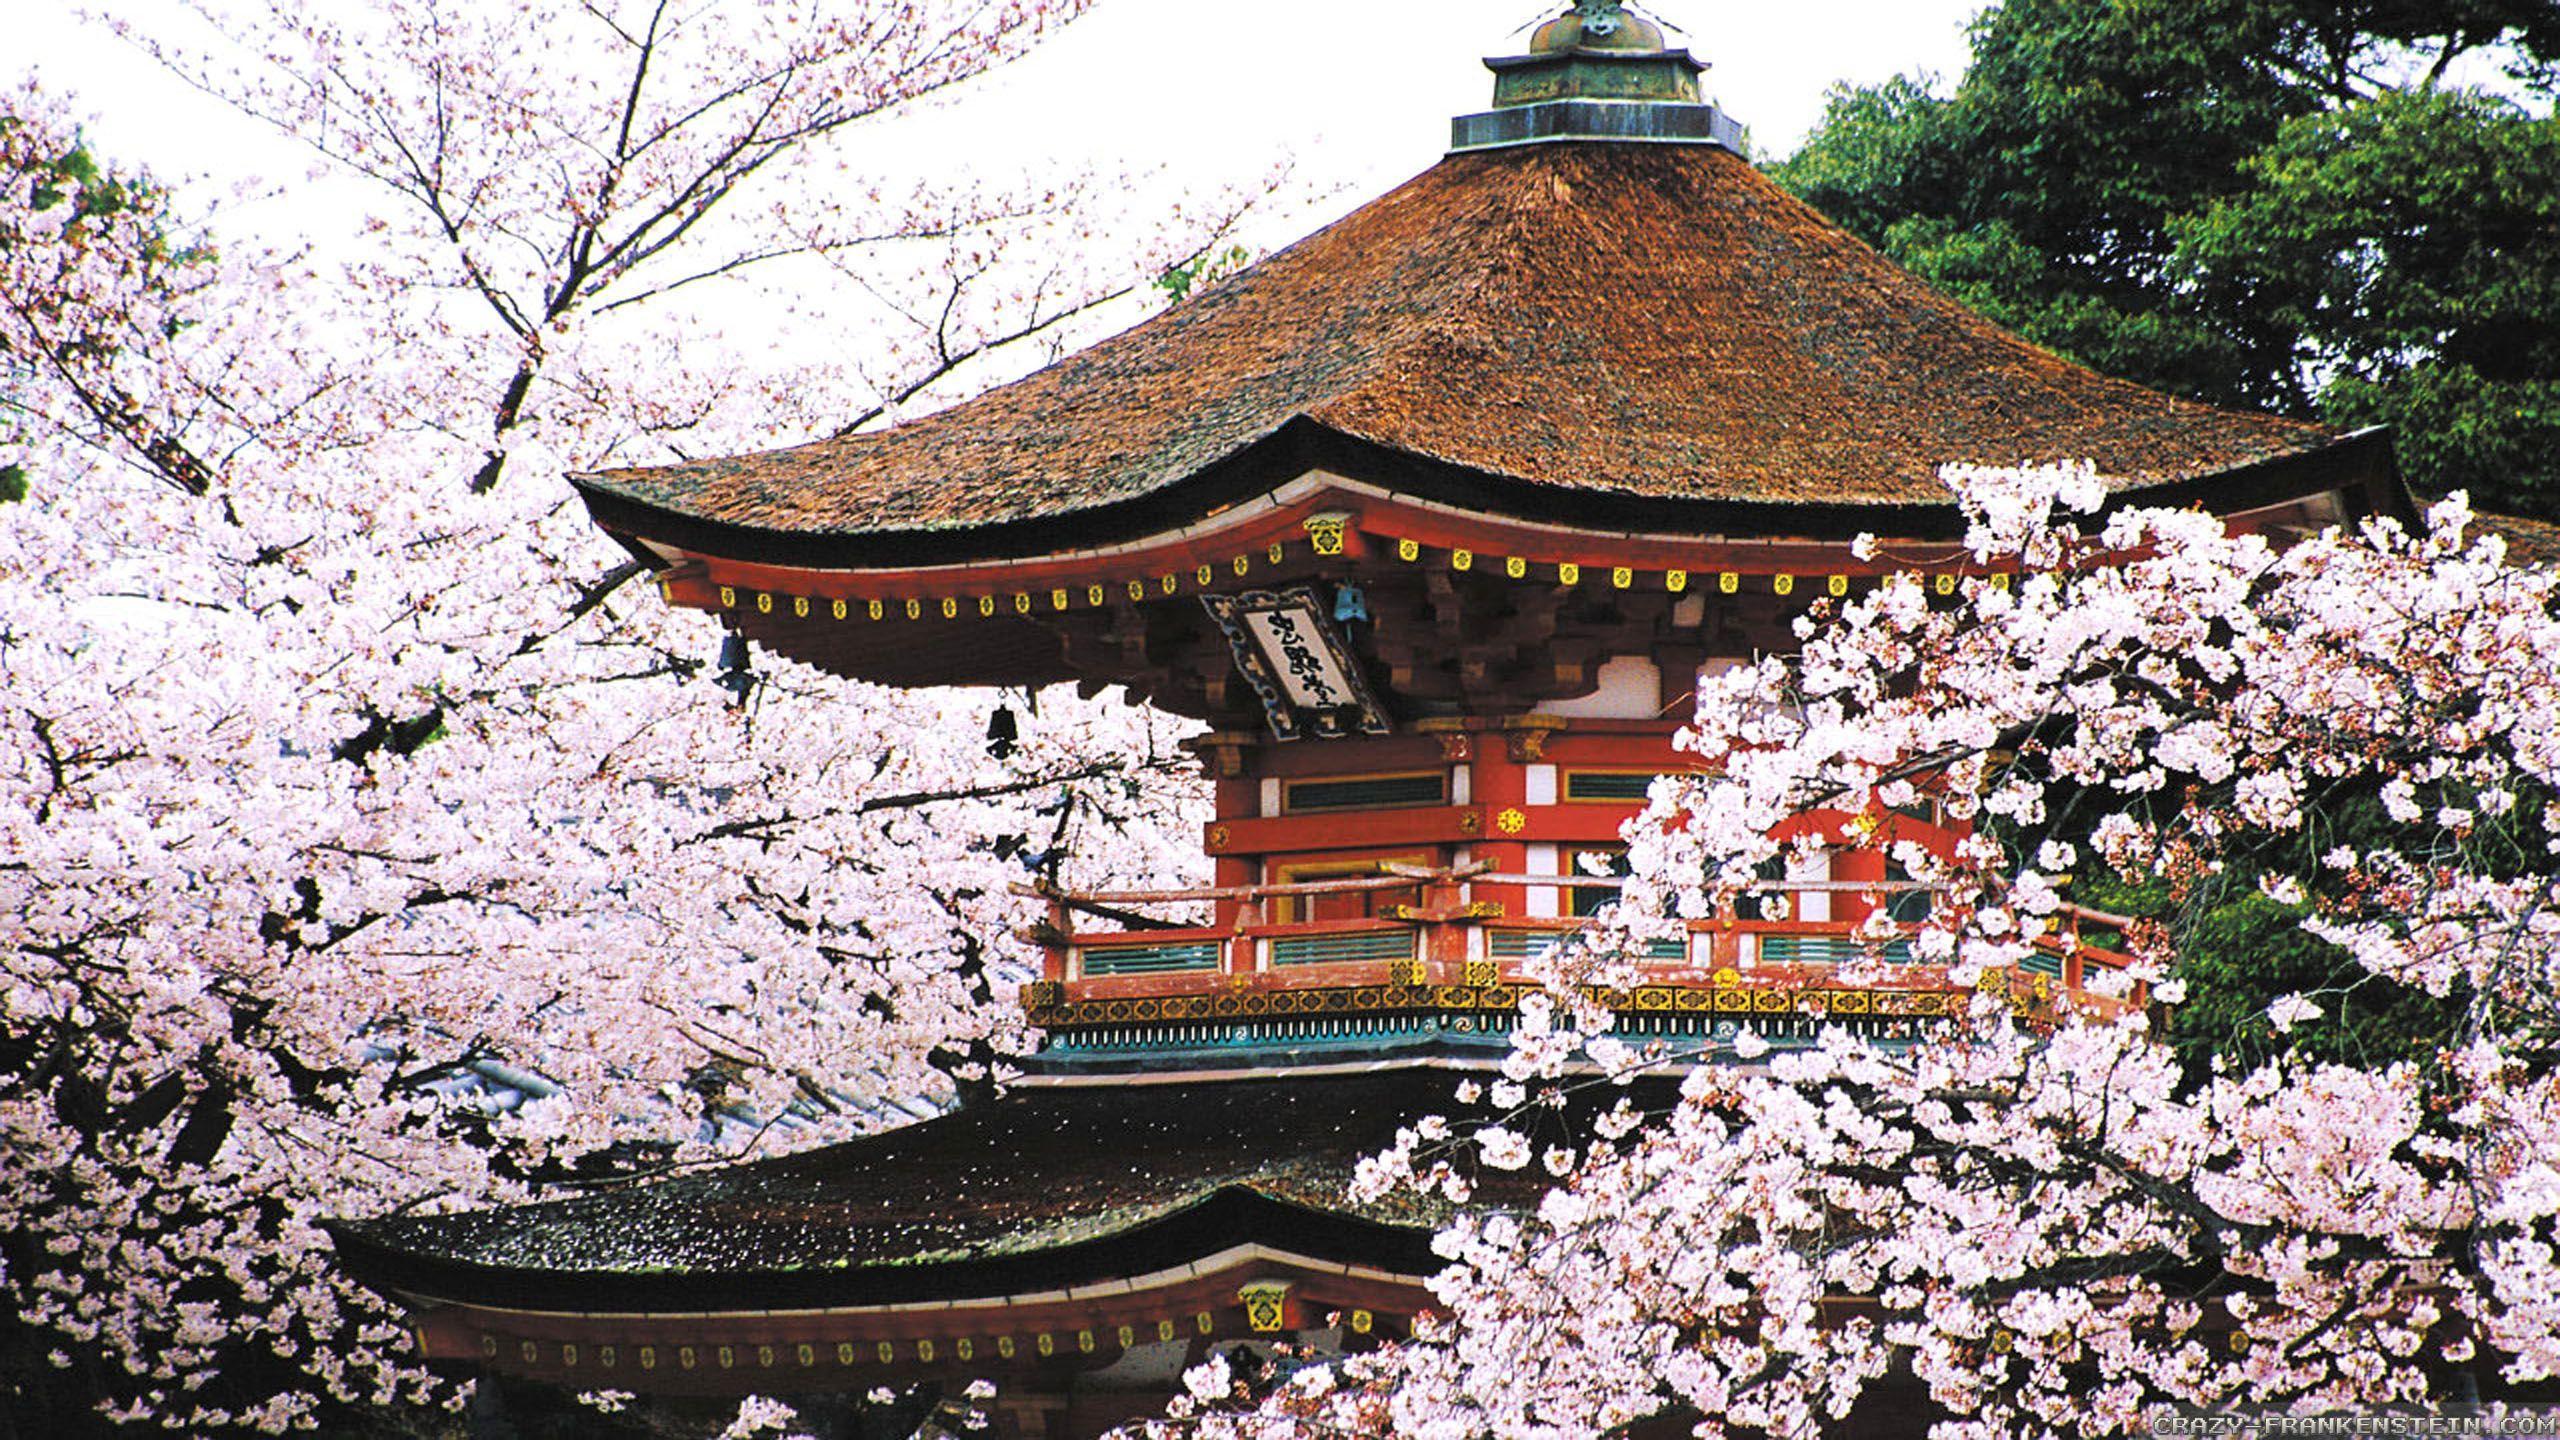 Kyoto Cherry Blossom Desktop Wallpapers